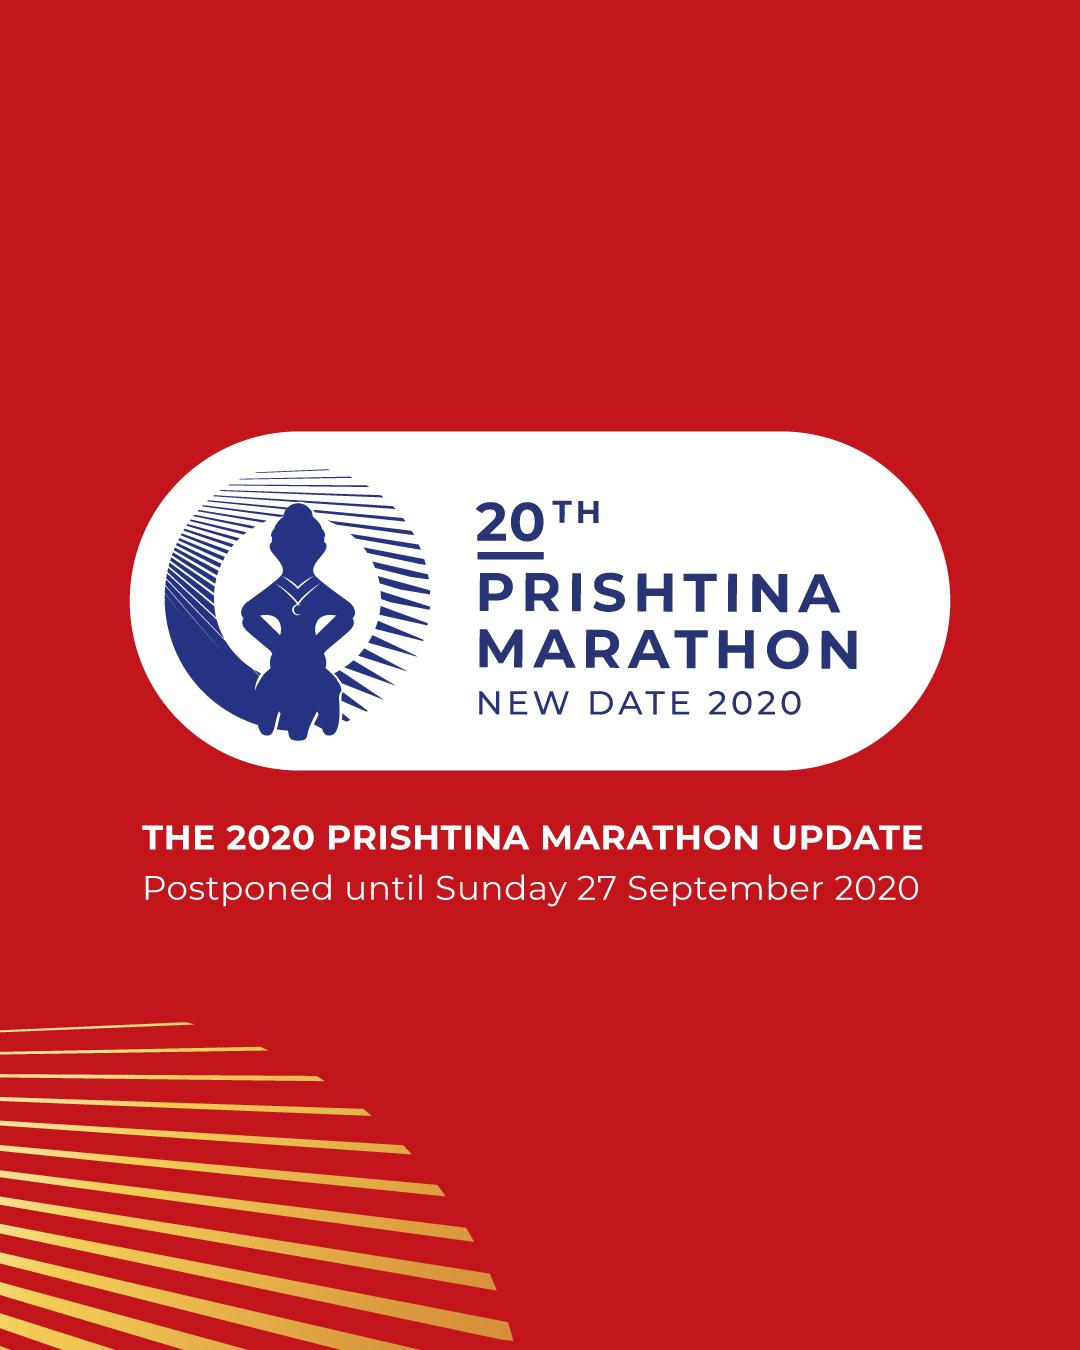 Prishtina Marathon Postponed